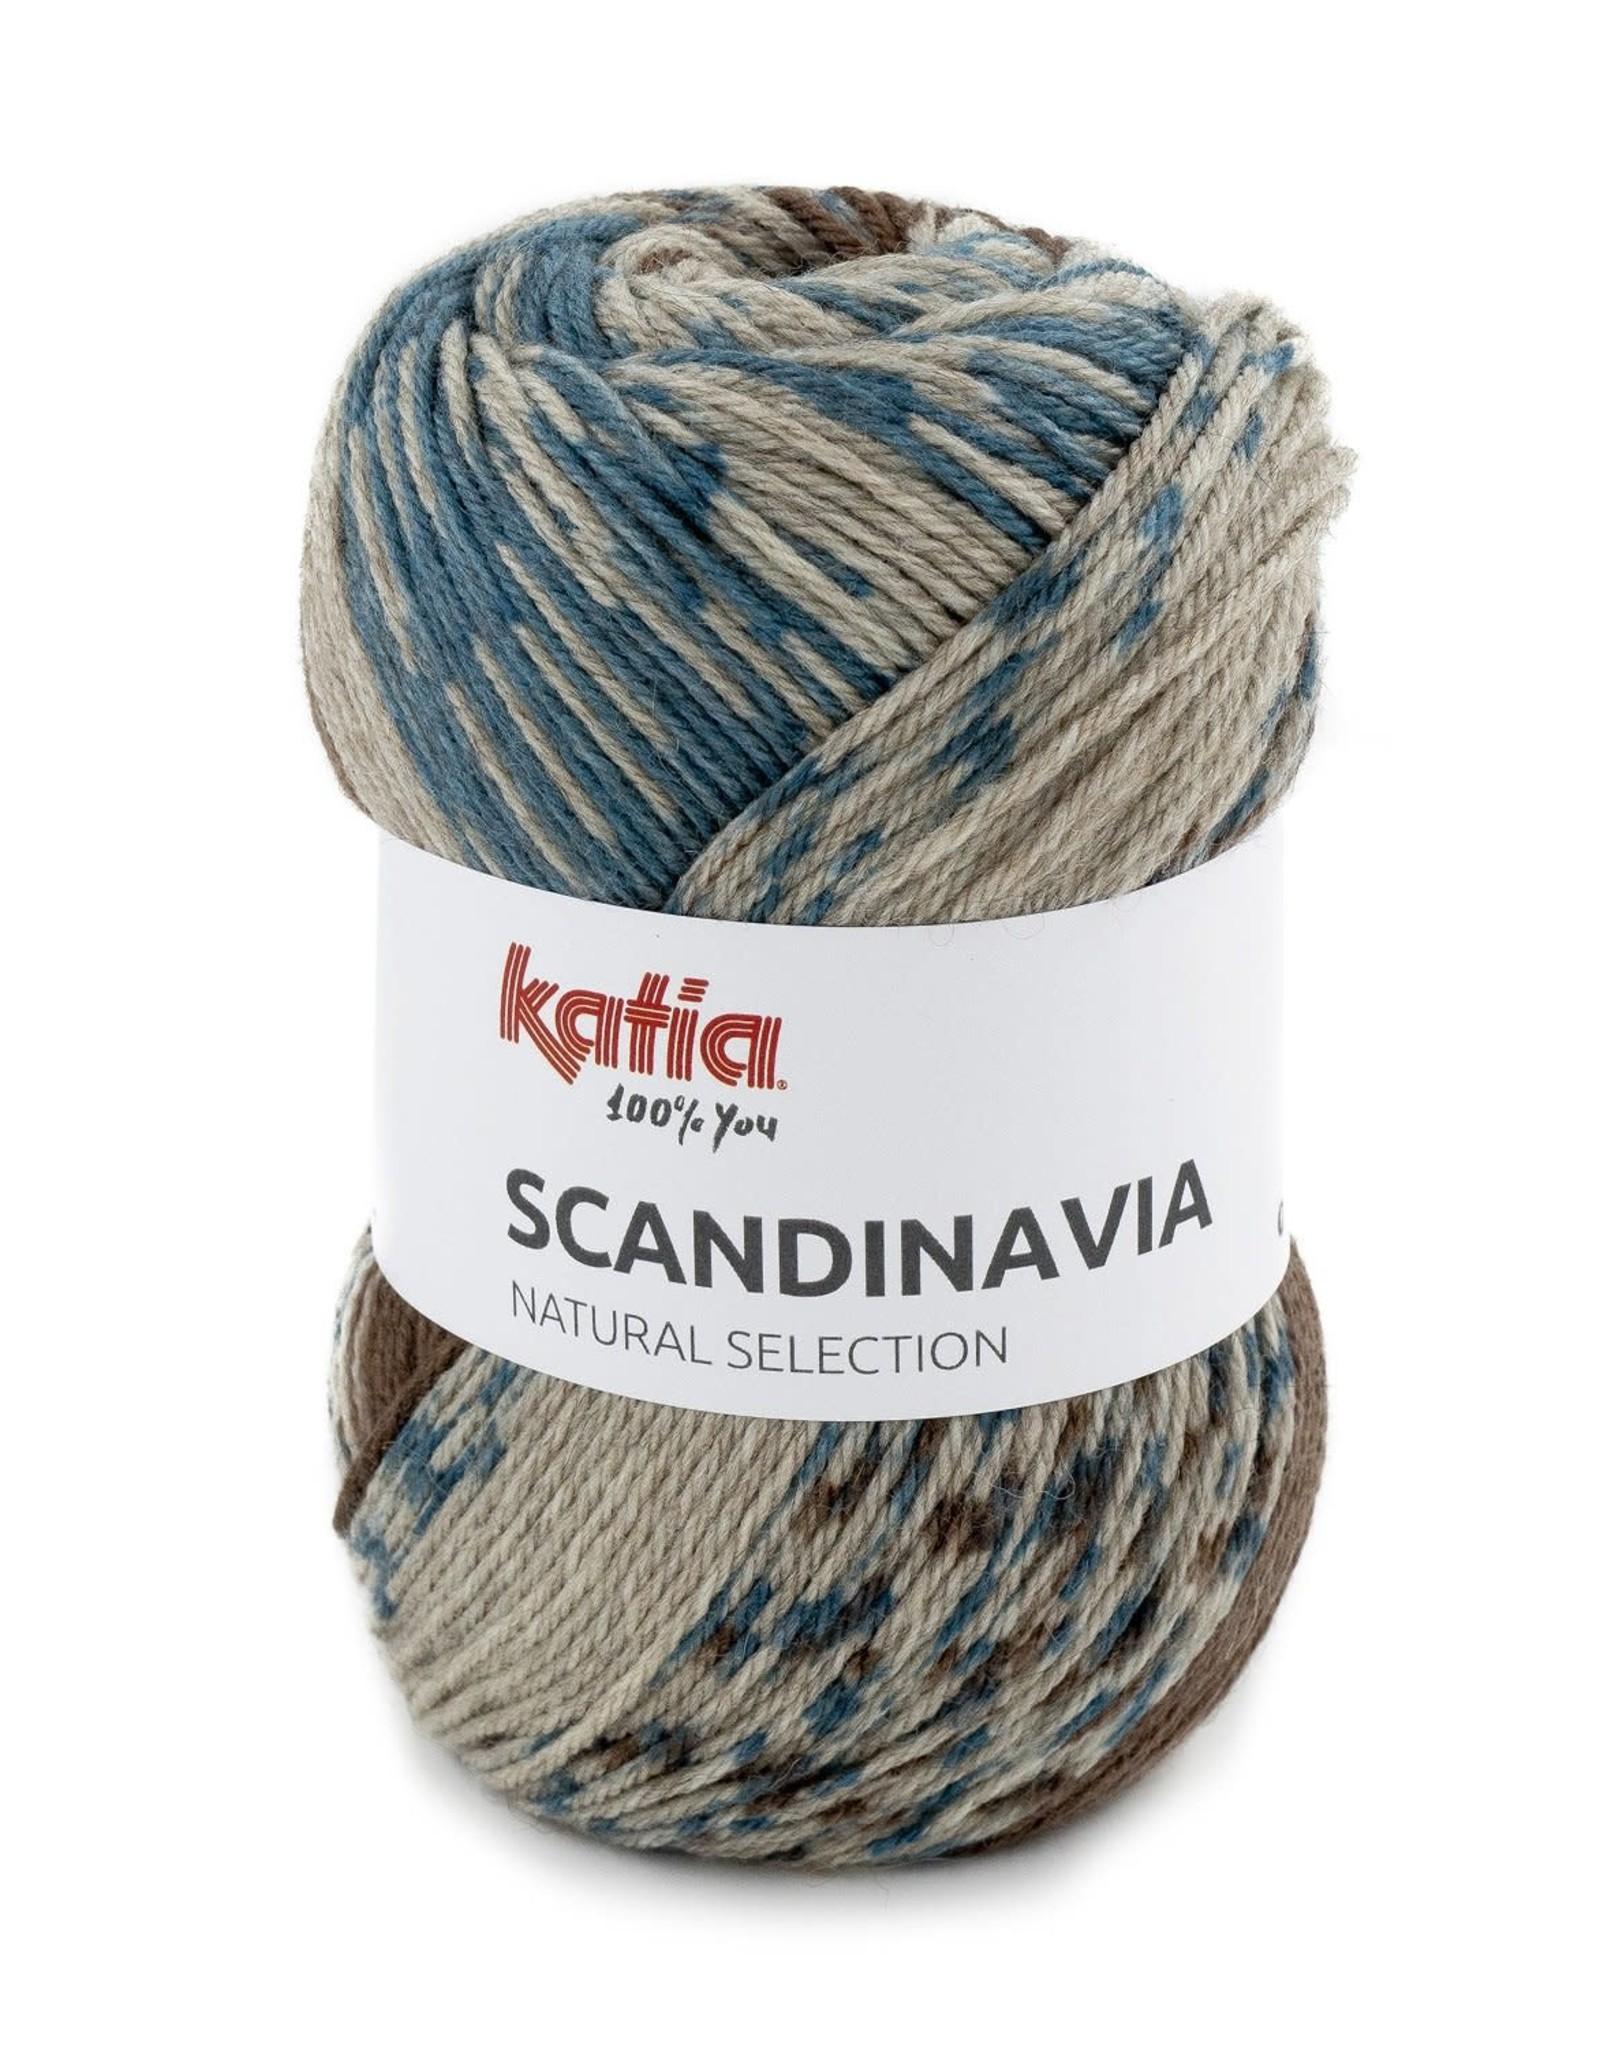 Katia Katia scandinavia 202 - Groenblauw-Bruin